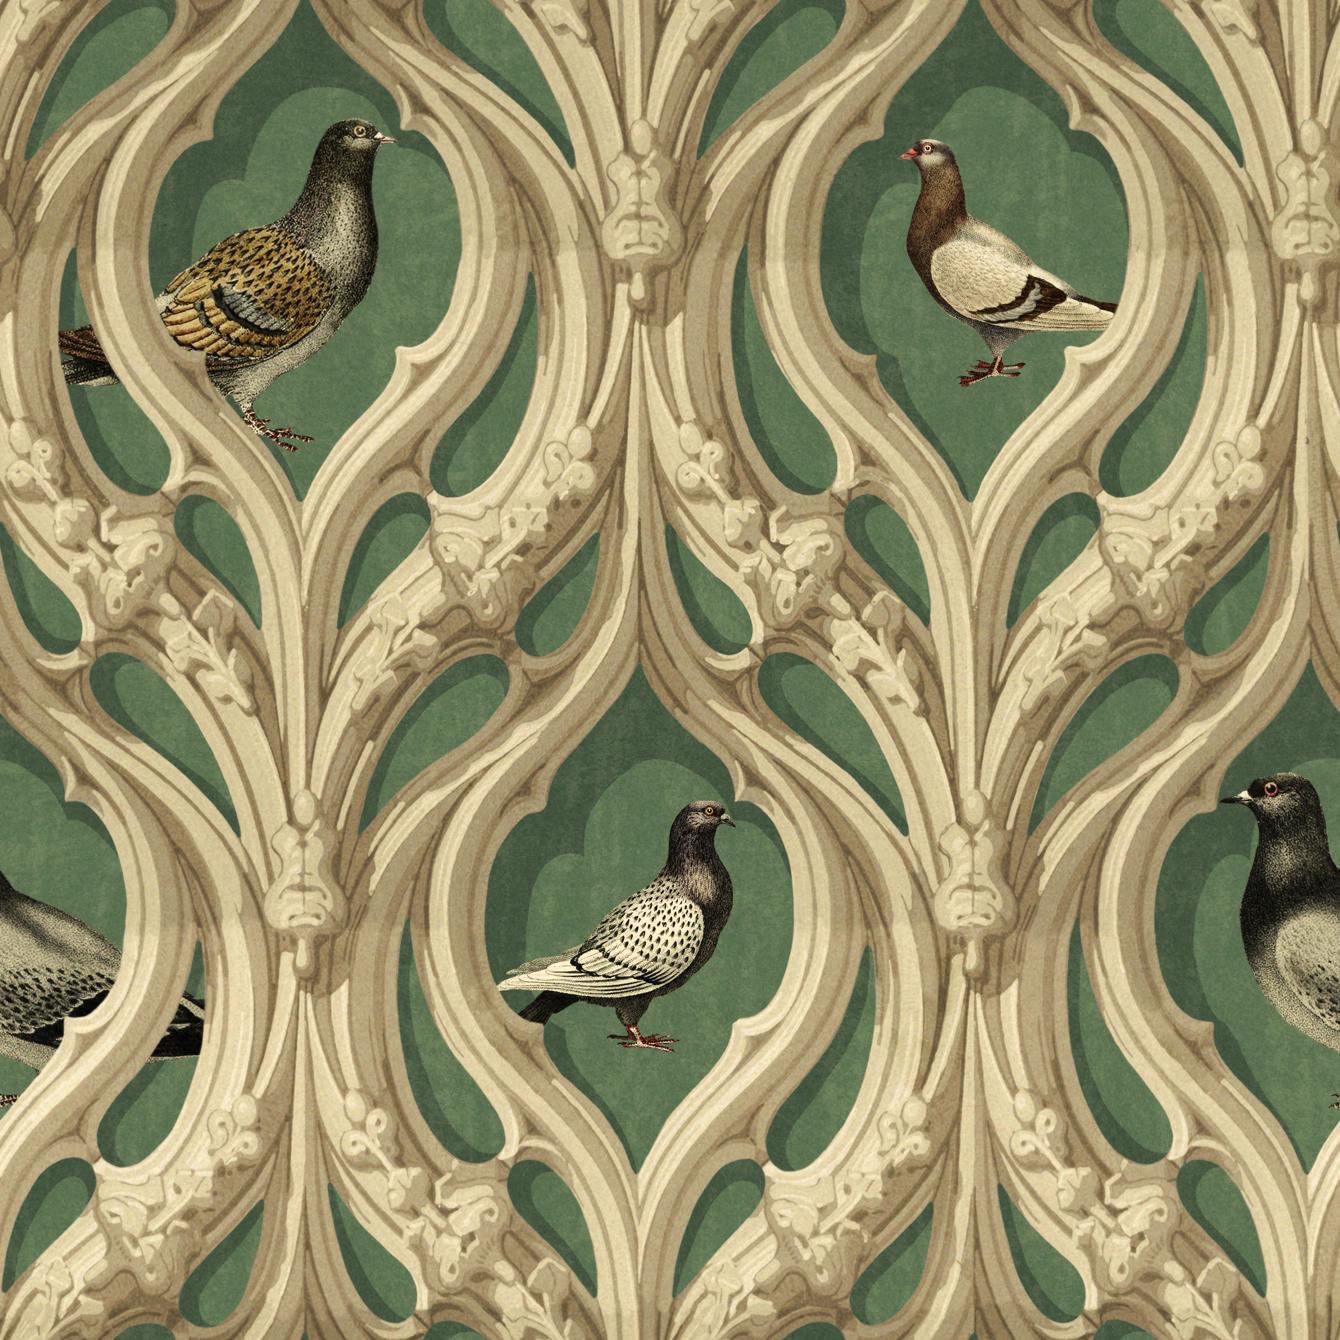 MANOR'S WALLS Wallpaper